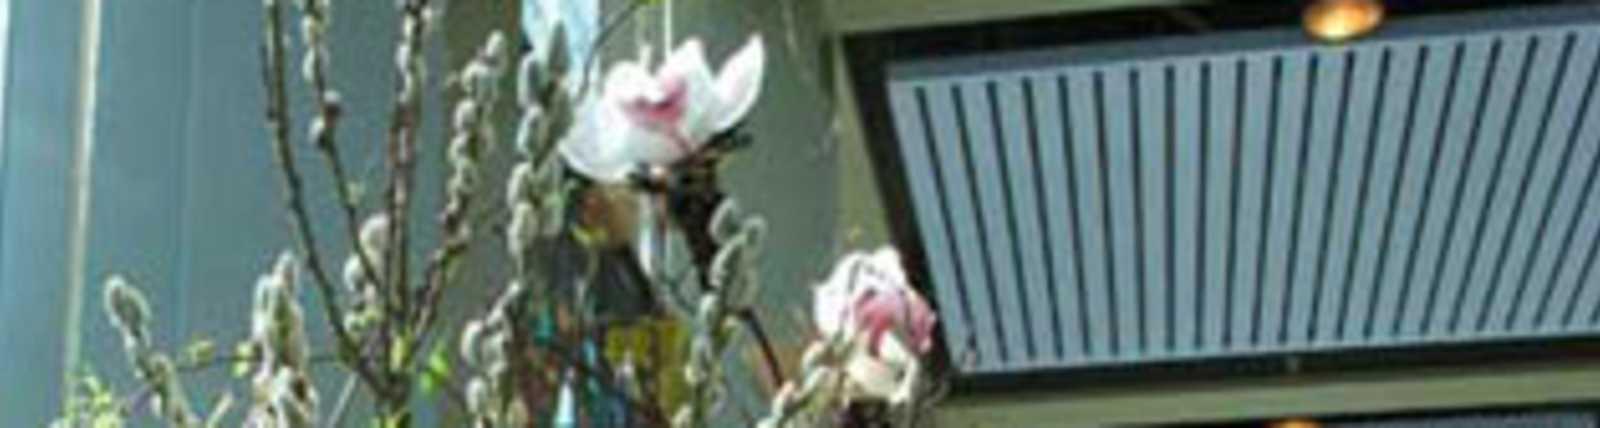 Flora_Laura__Marine_View_Florist_-4.jpg